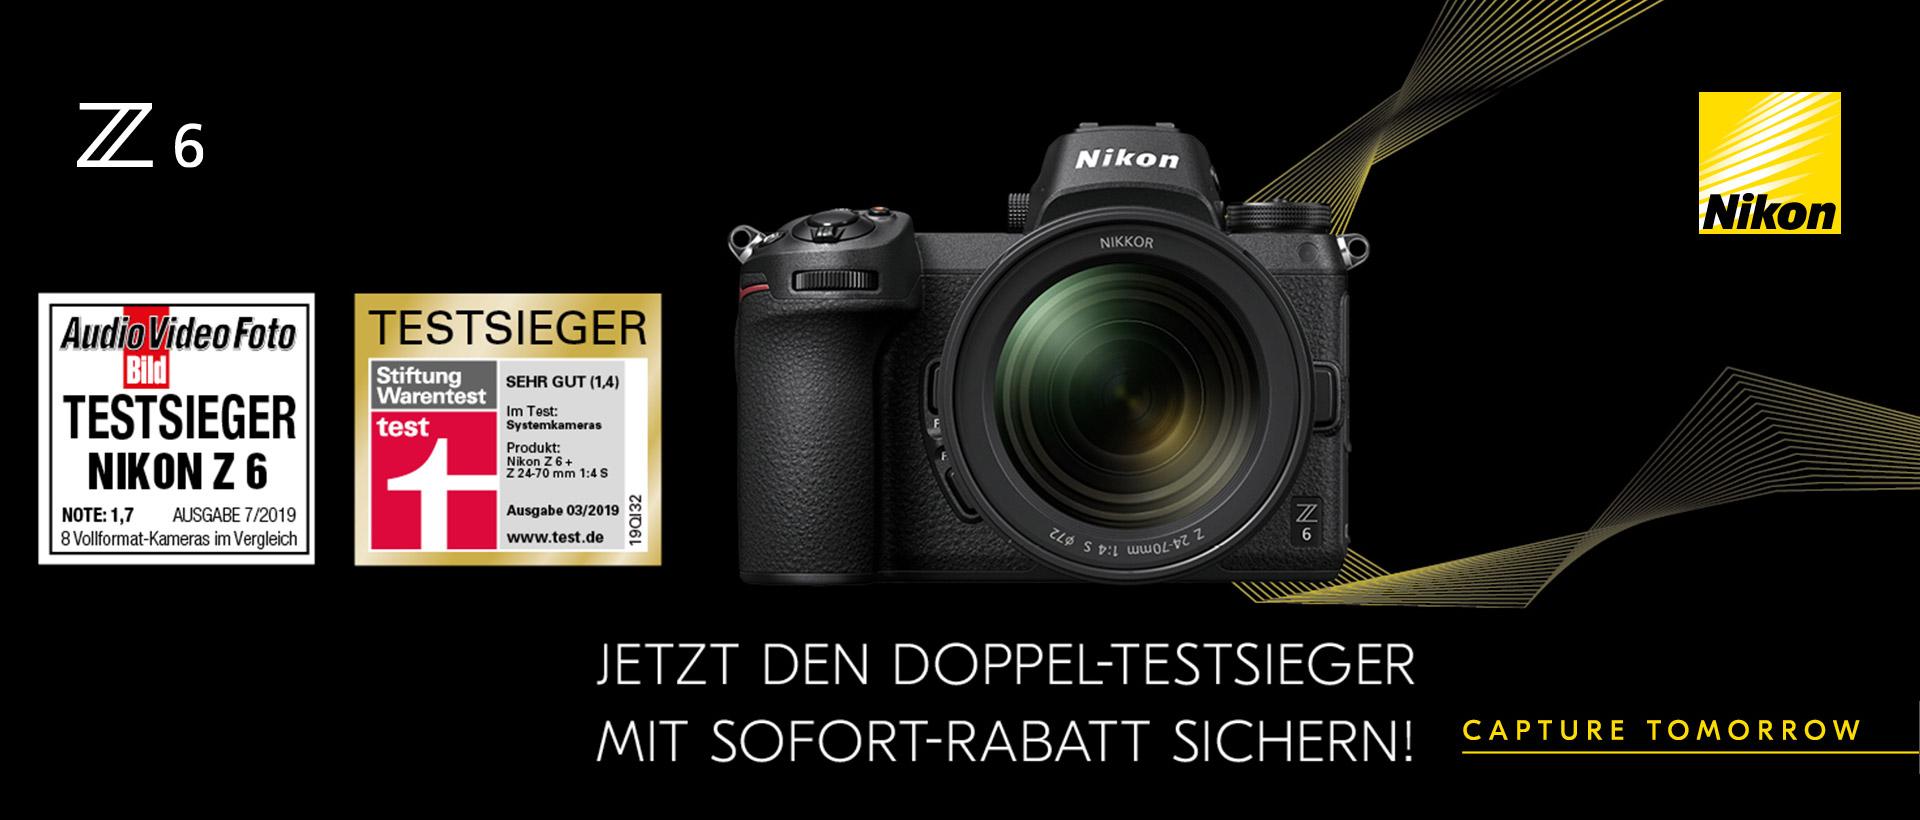 Nikon Z6 - Doppelter Testsieger